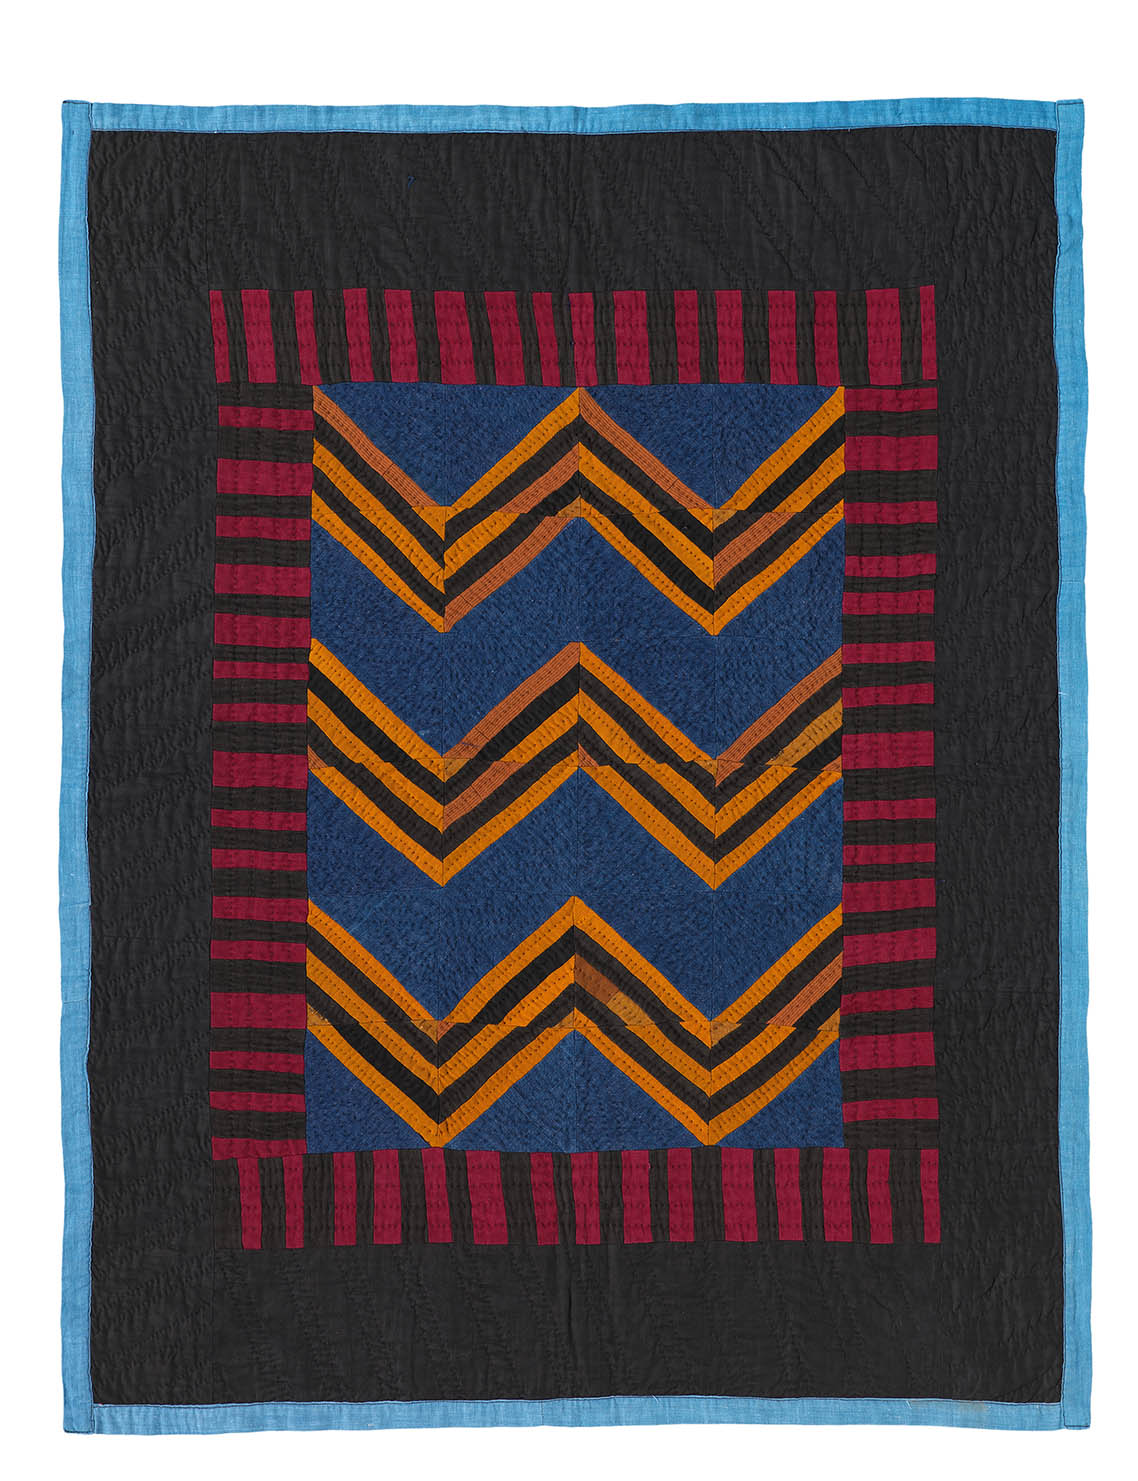 094: ZigZag (Roman Stripe variation) crib quilt, Haven, KS circa 1930 35x26